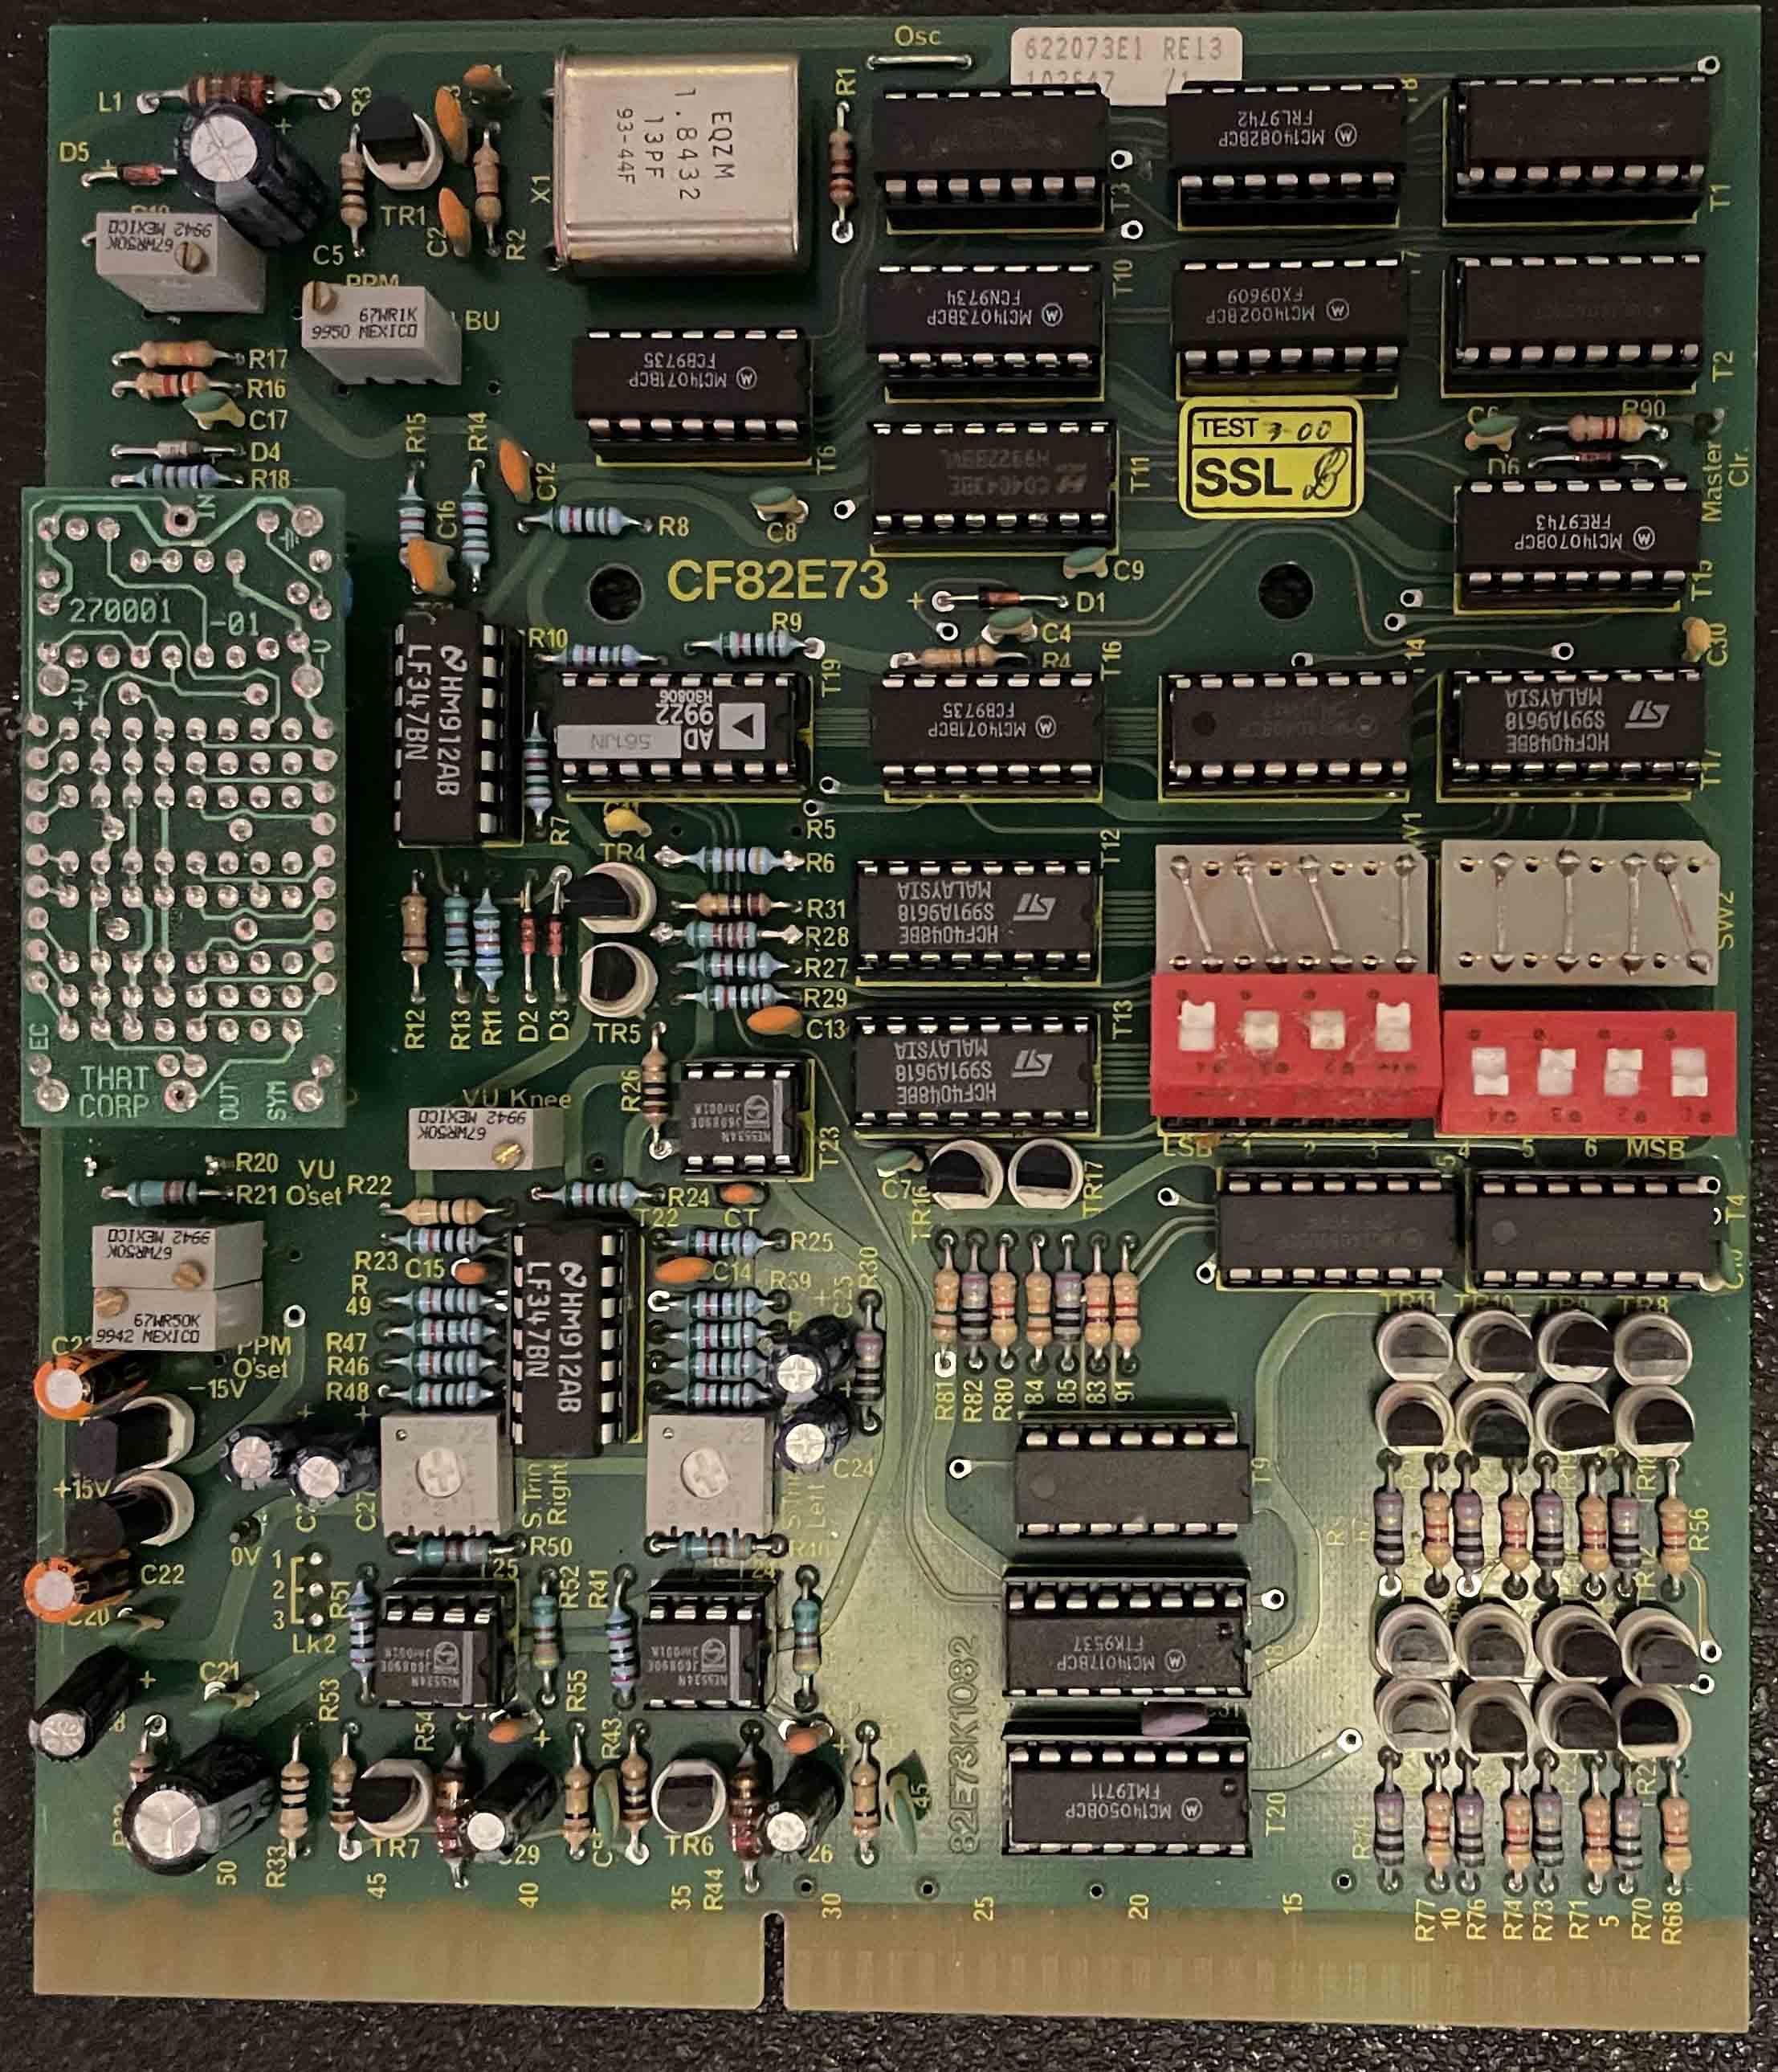 CF82E73 CARD